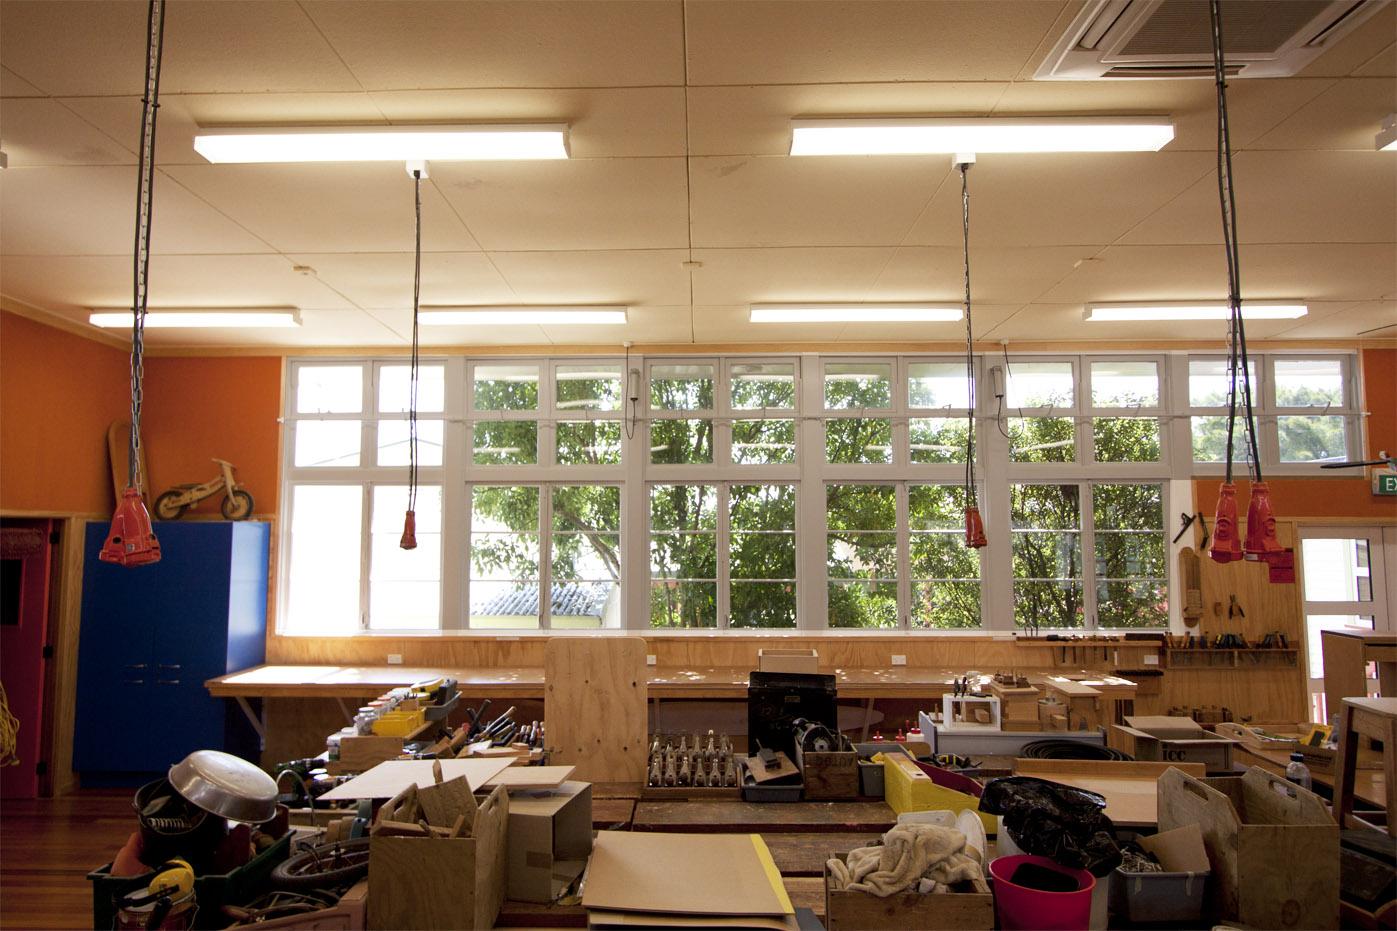 LE_Commercial_School2.jpg